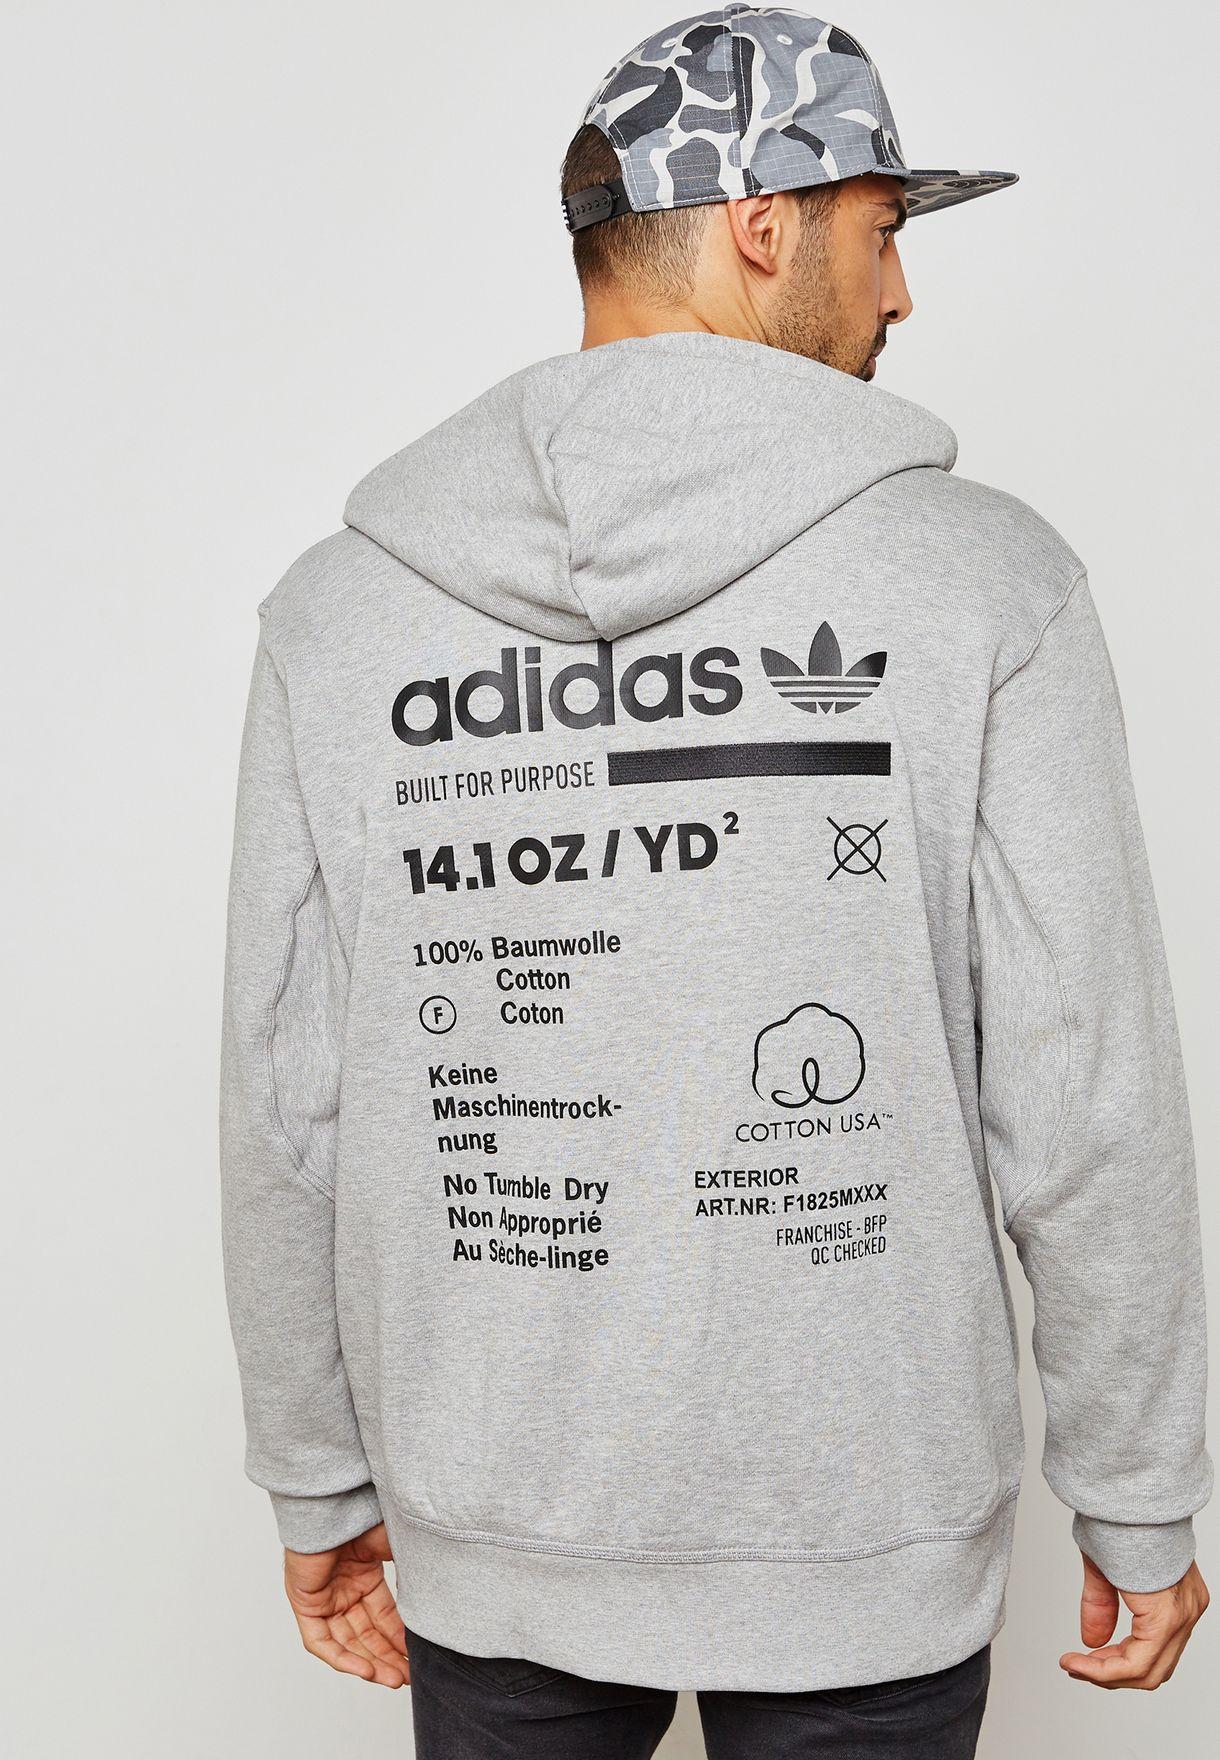 adidas classic grey sweatshirt